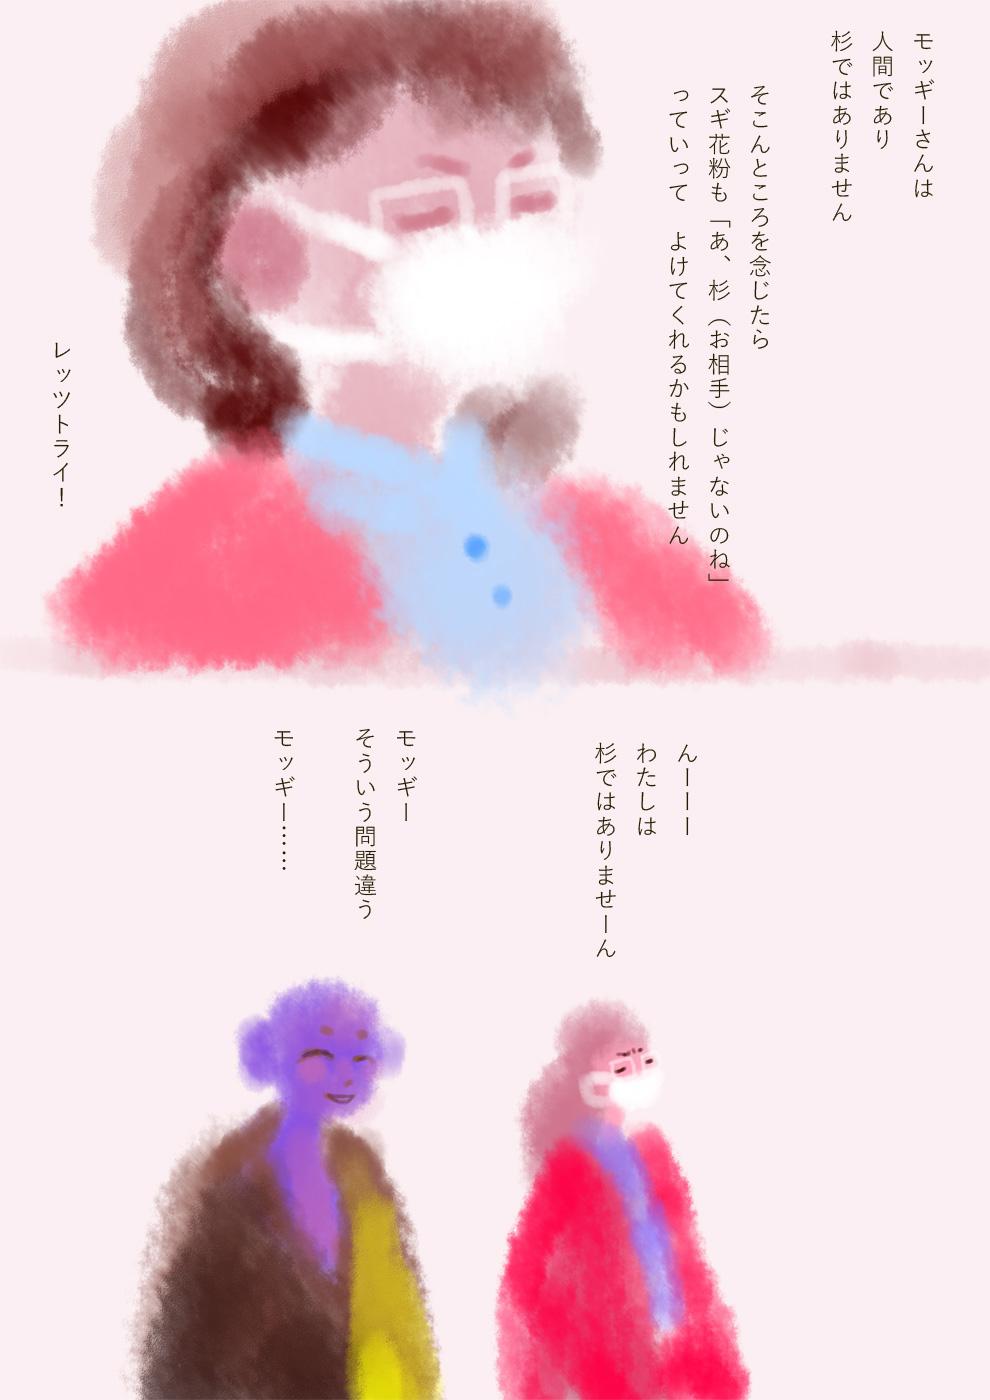 http://ahito.com/comic/ehon/kamiuta/img/2018/20180320_2/02.jpg